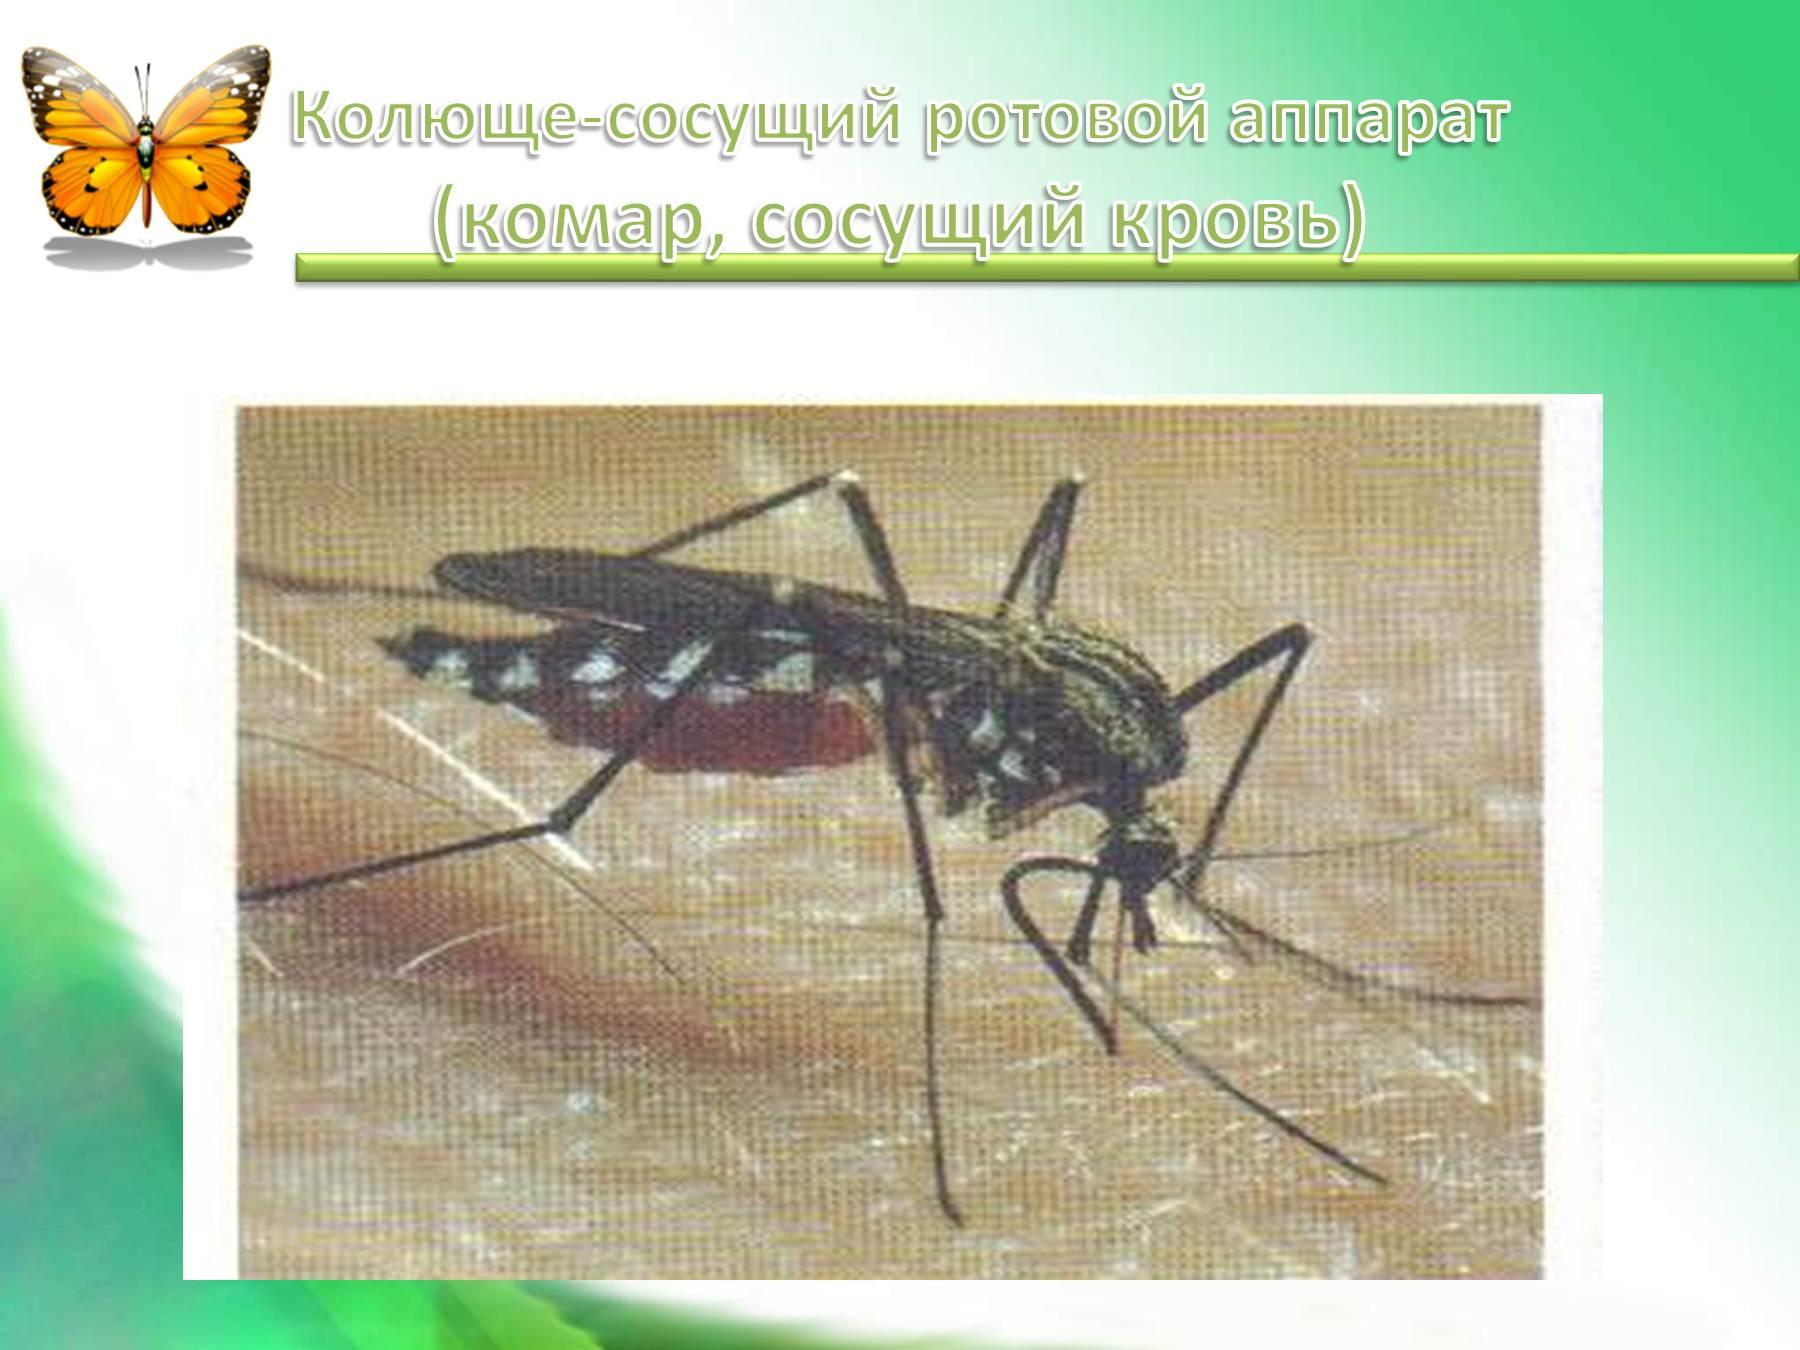 grizushe-lizhushiy-rotovoy-apparat-imeet